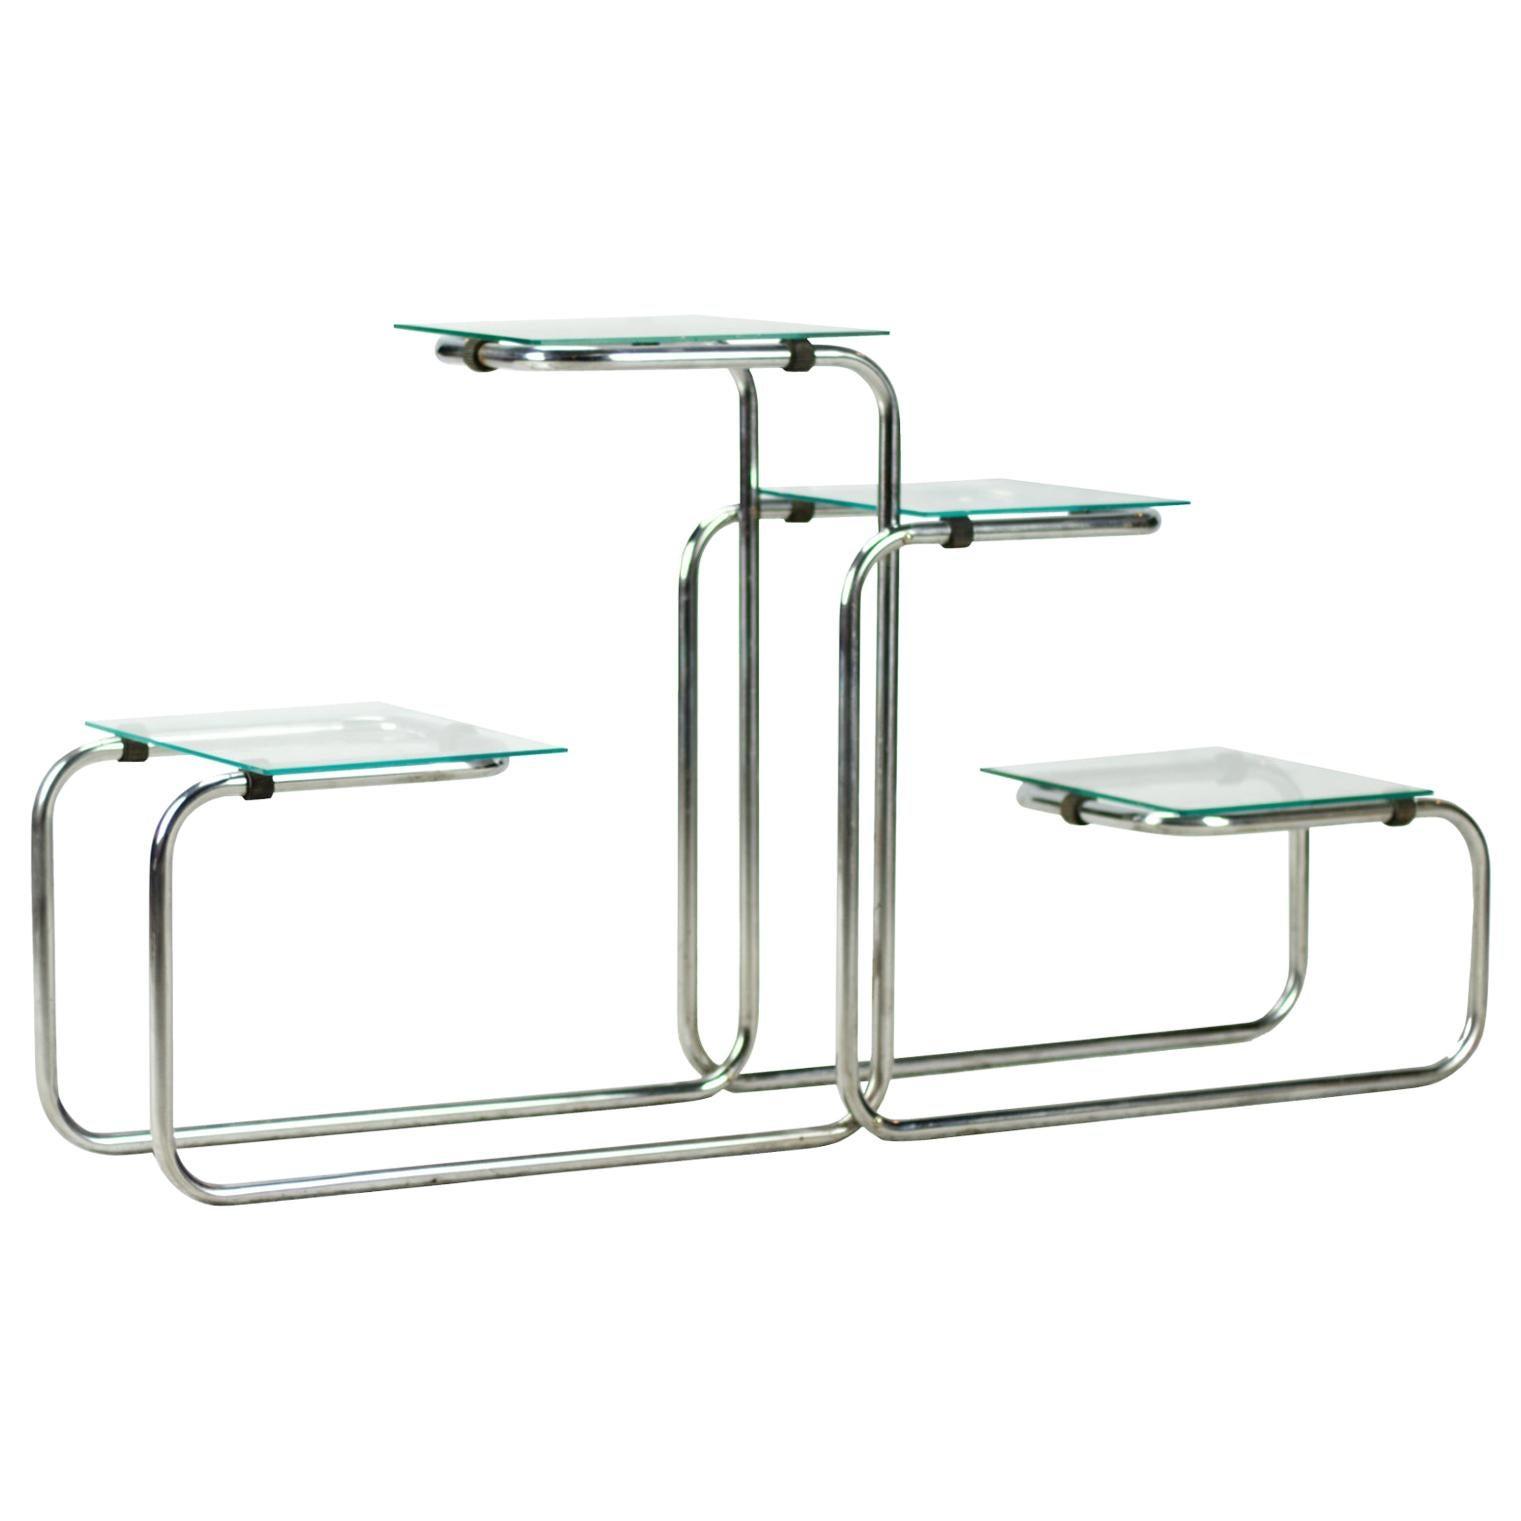 Bauhaus Chrome-Plated Tubular Steel Étagère / Flower Stand, 1930s